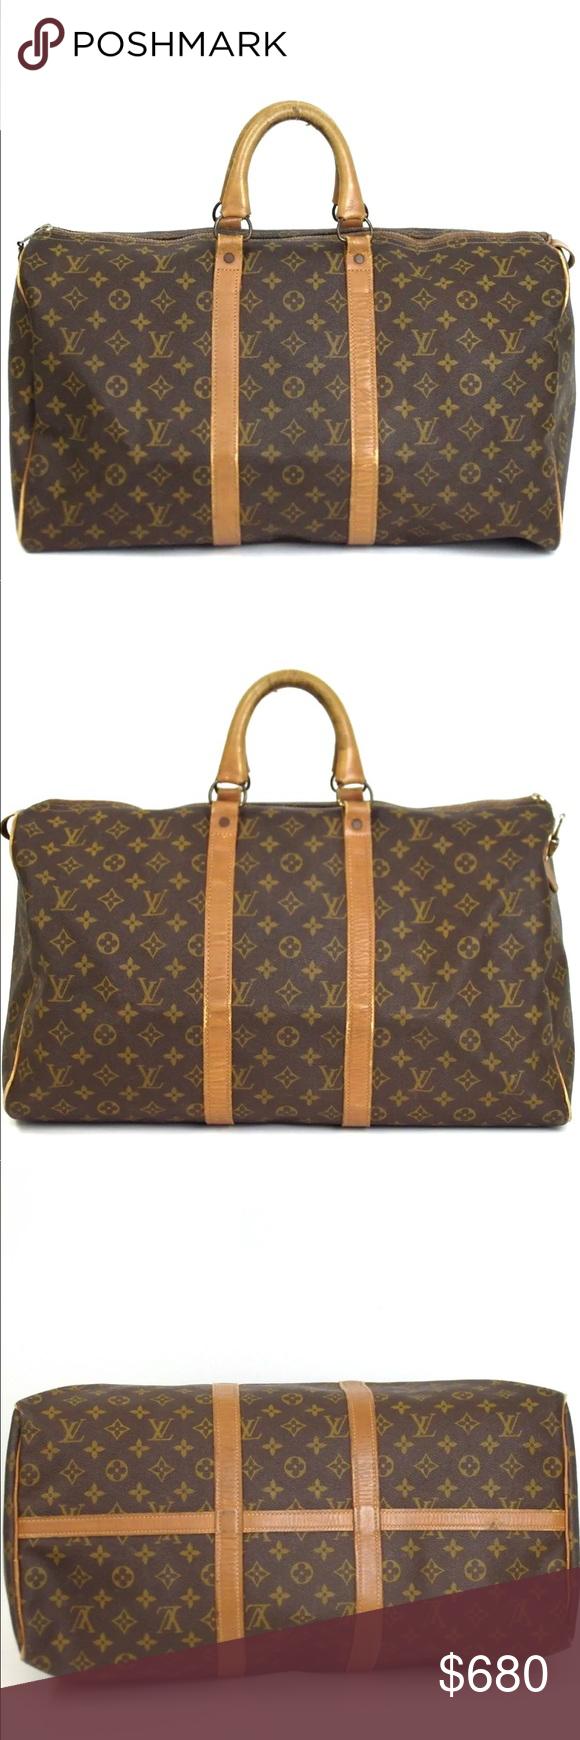 Auth RARE Louis Vuitton Keepall Bandouliere 50 Bag Louis